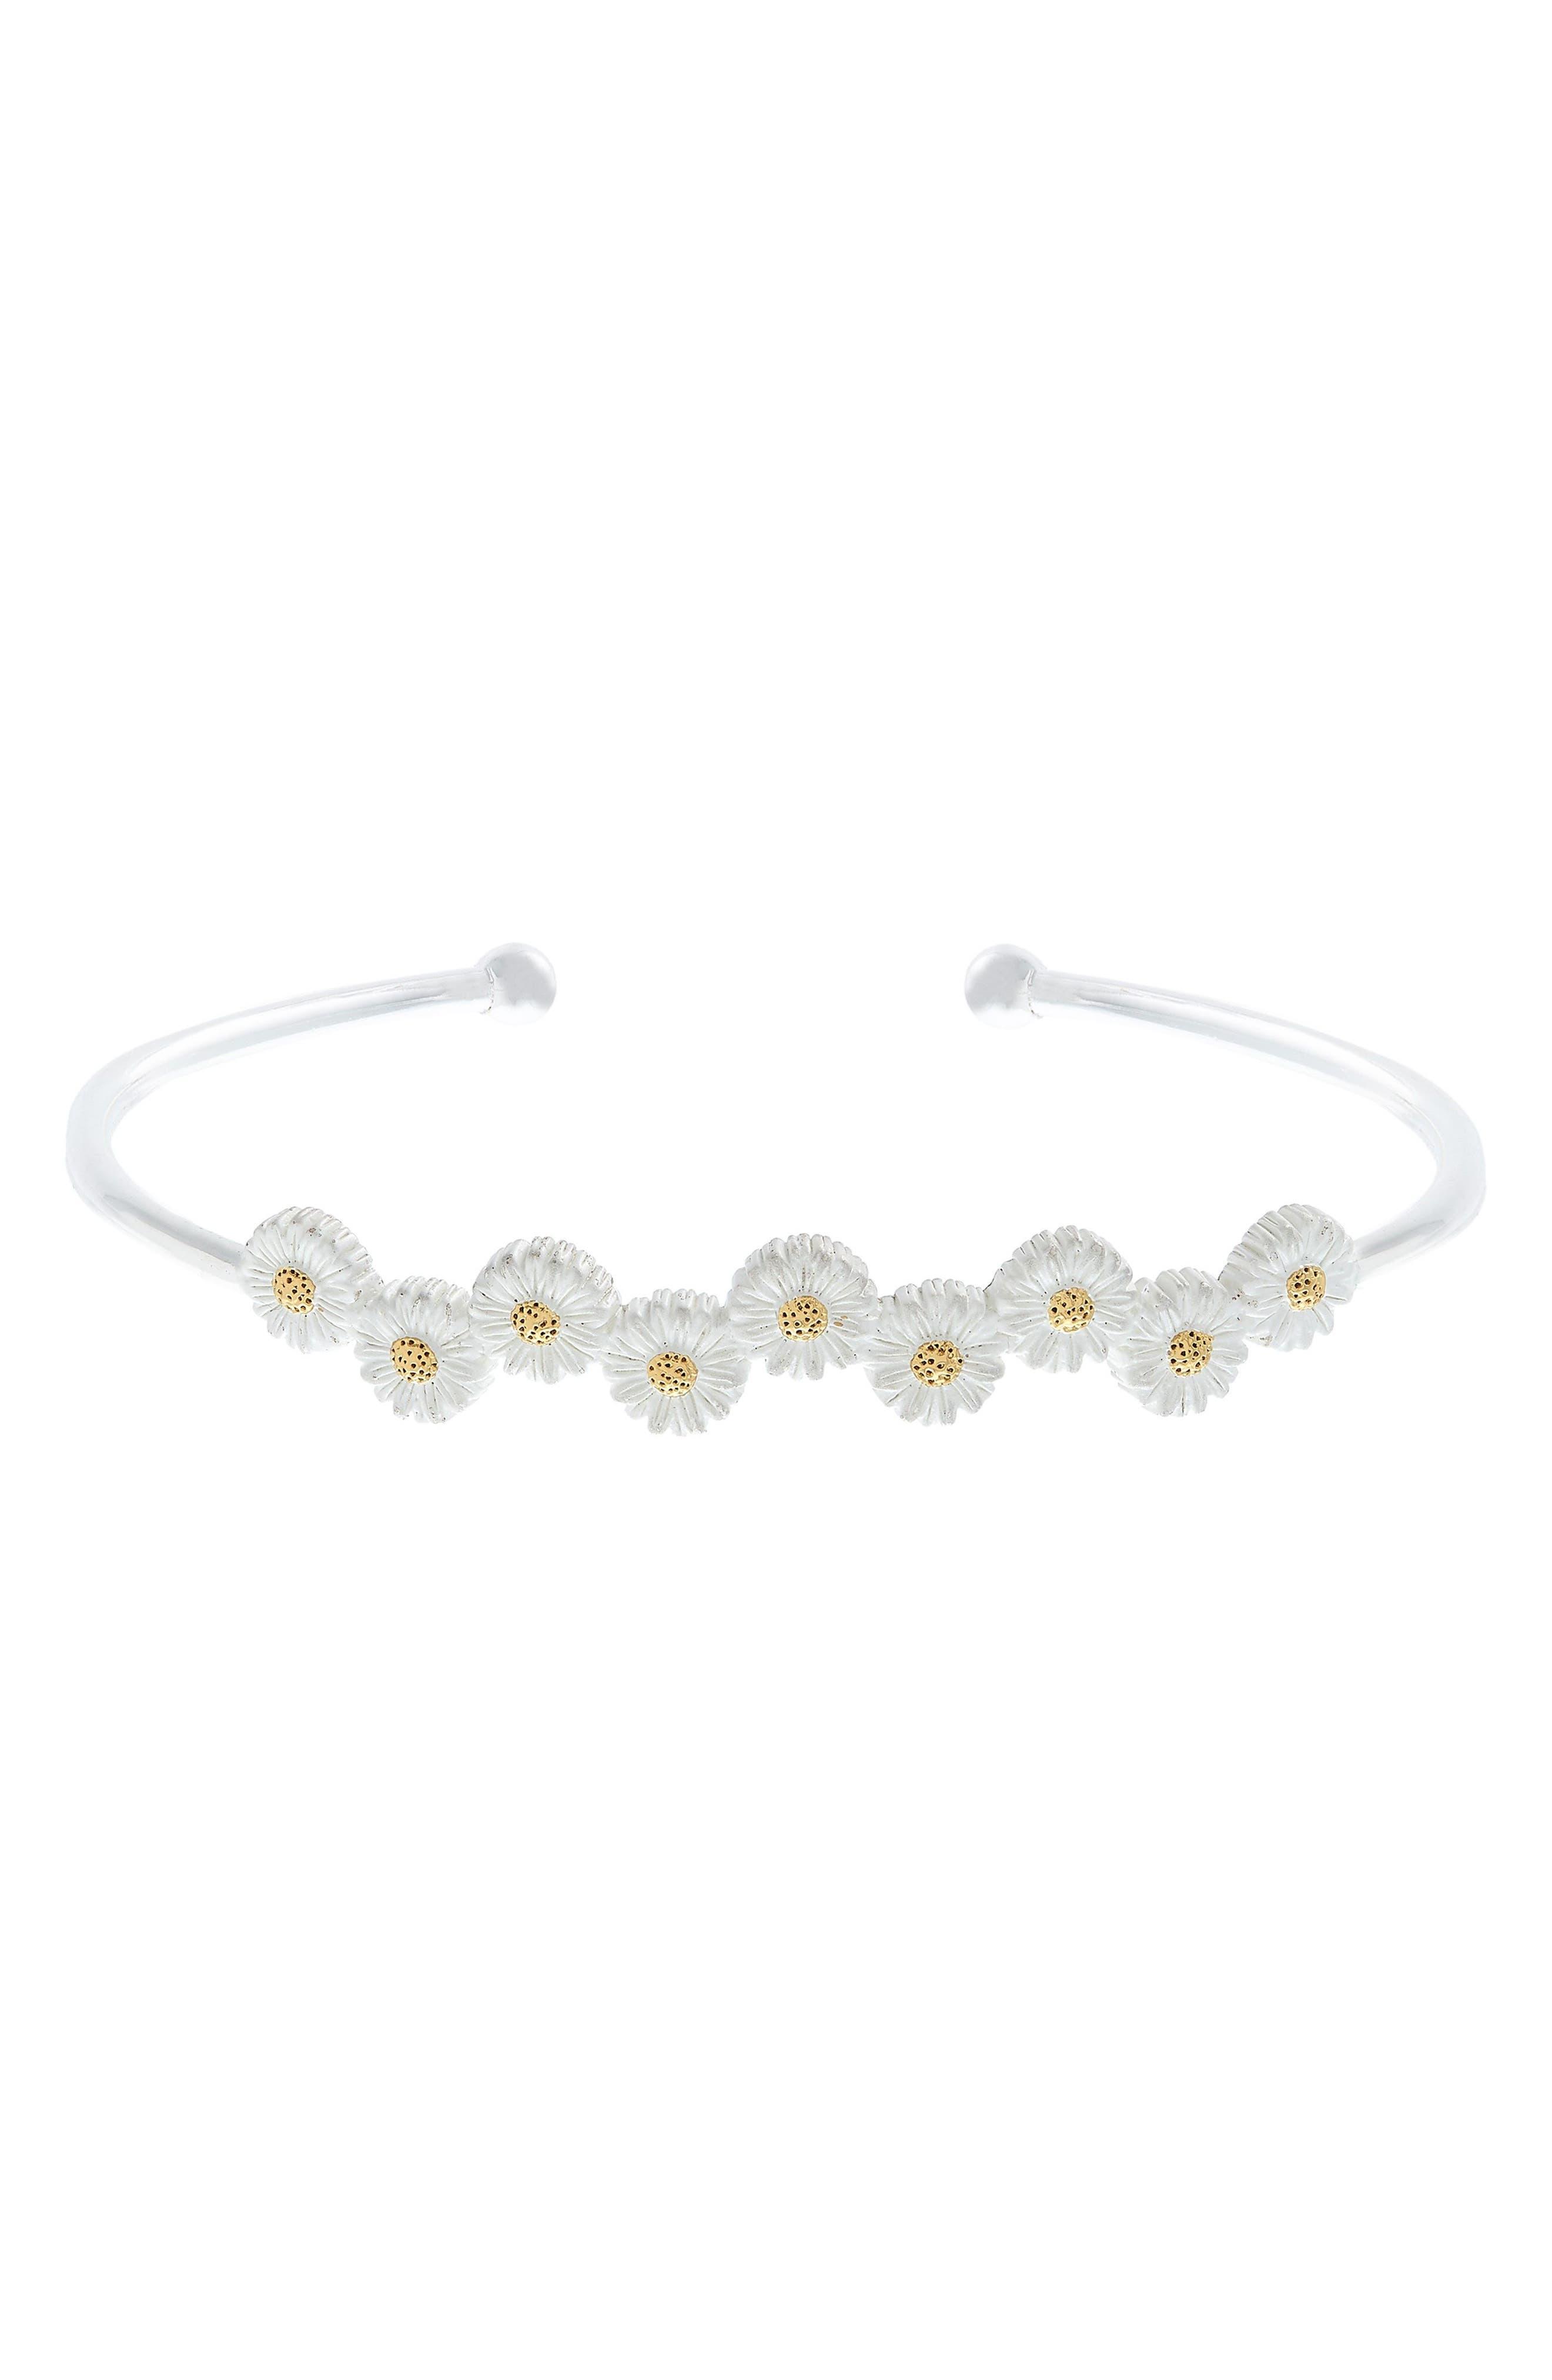 OLIVIA BURTON 3D Daisy Open Bangle Bracelet, Main, color, TWO TONE- SILVER / GOLD